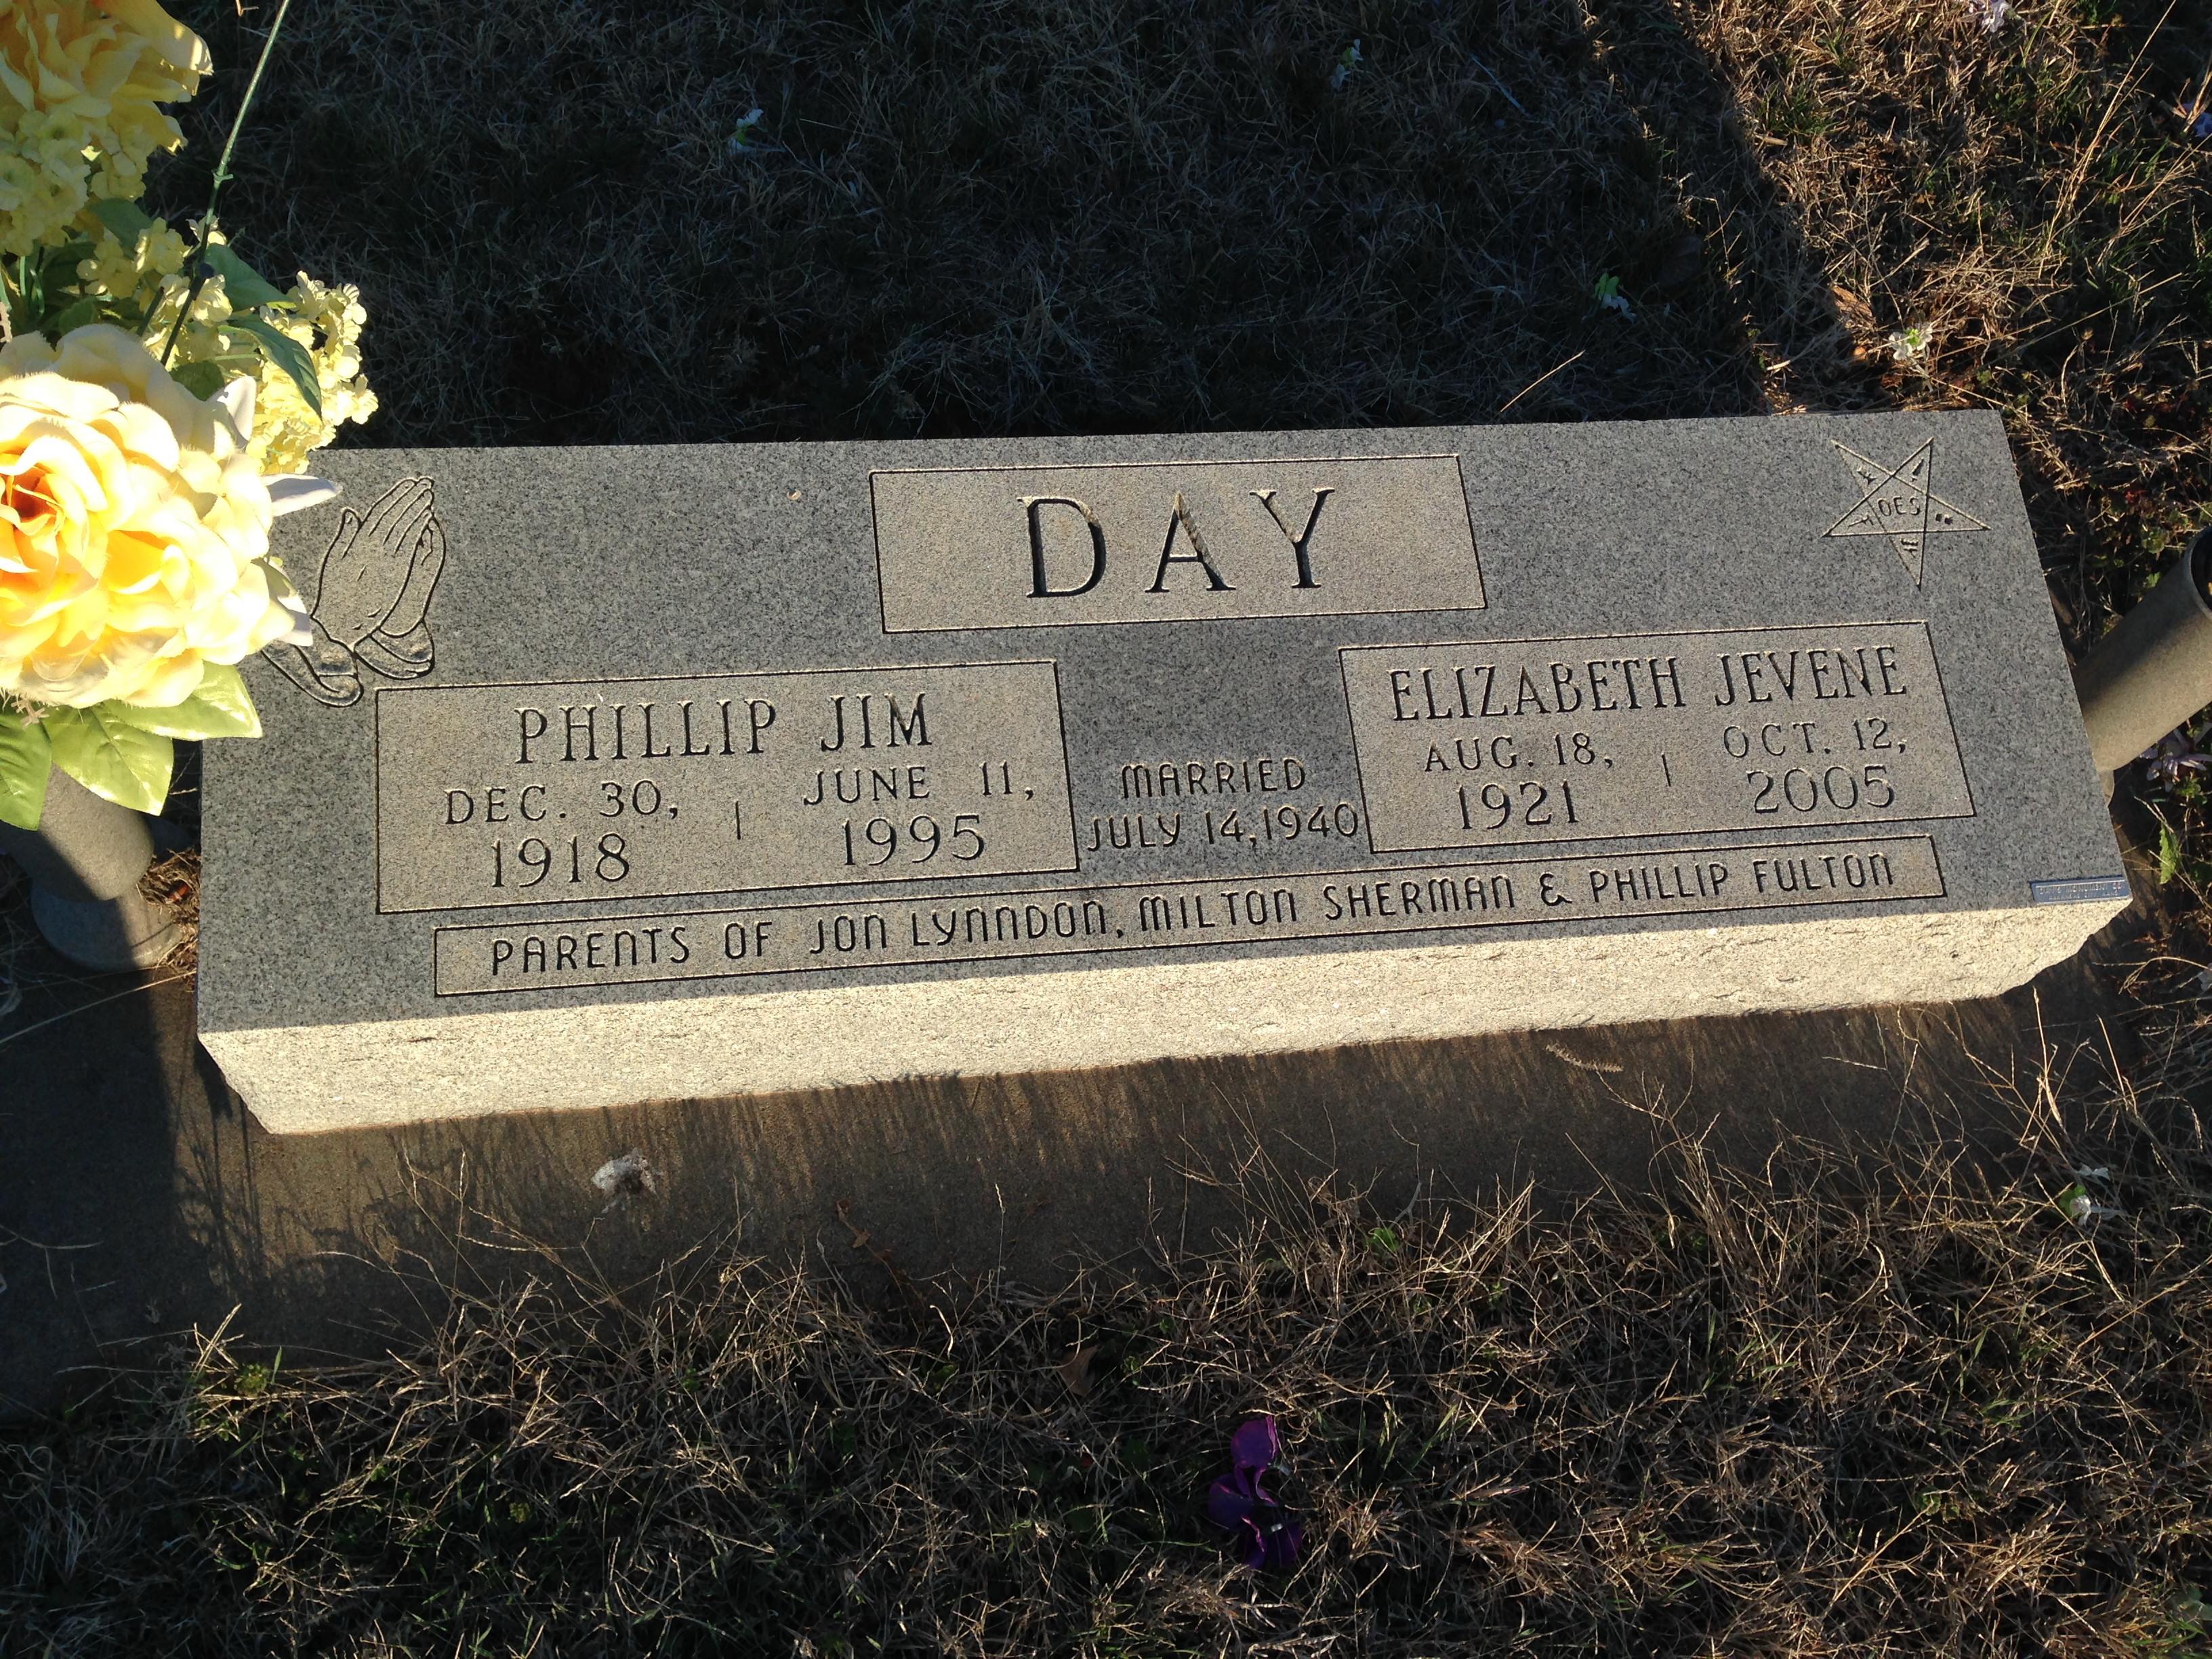 James Phillip Day